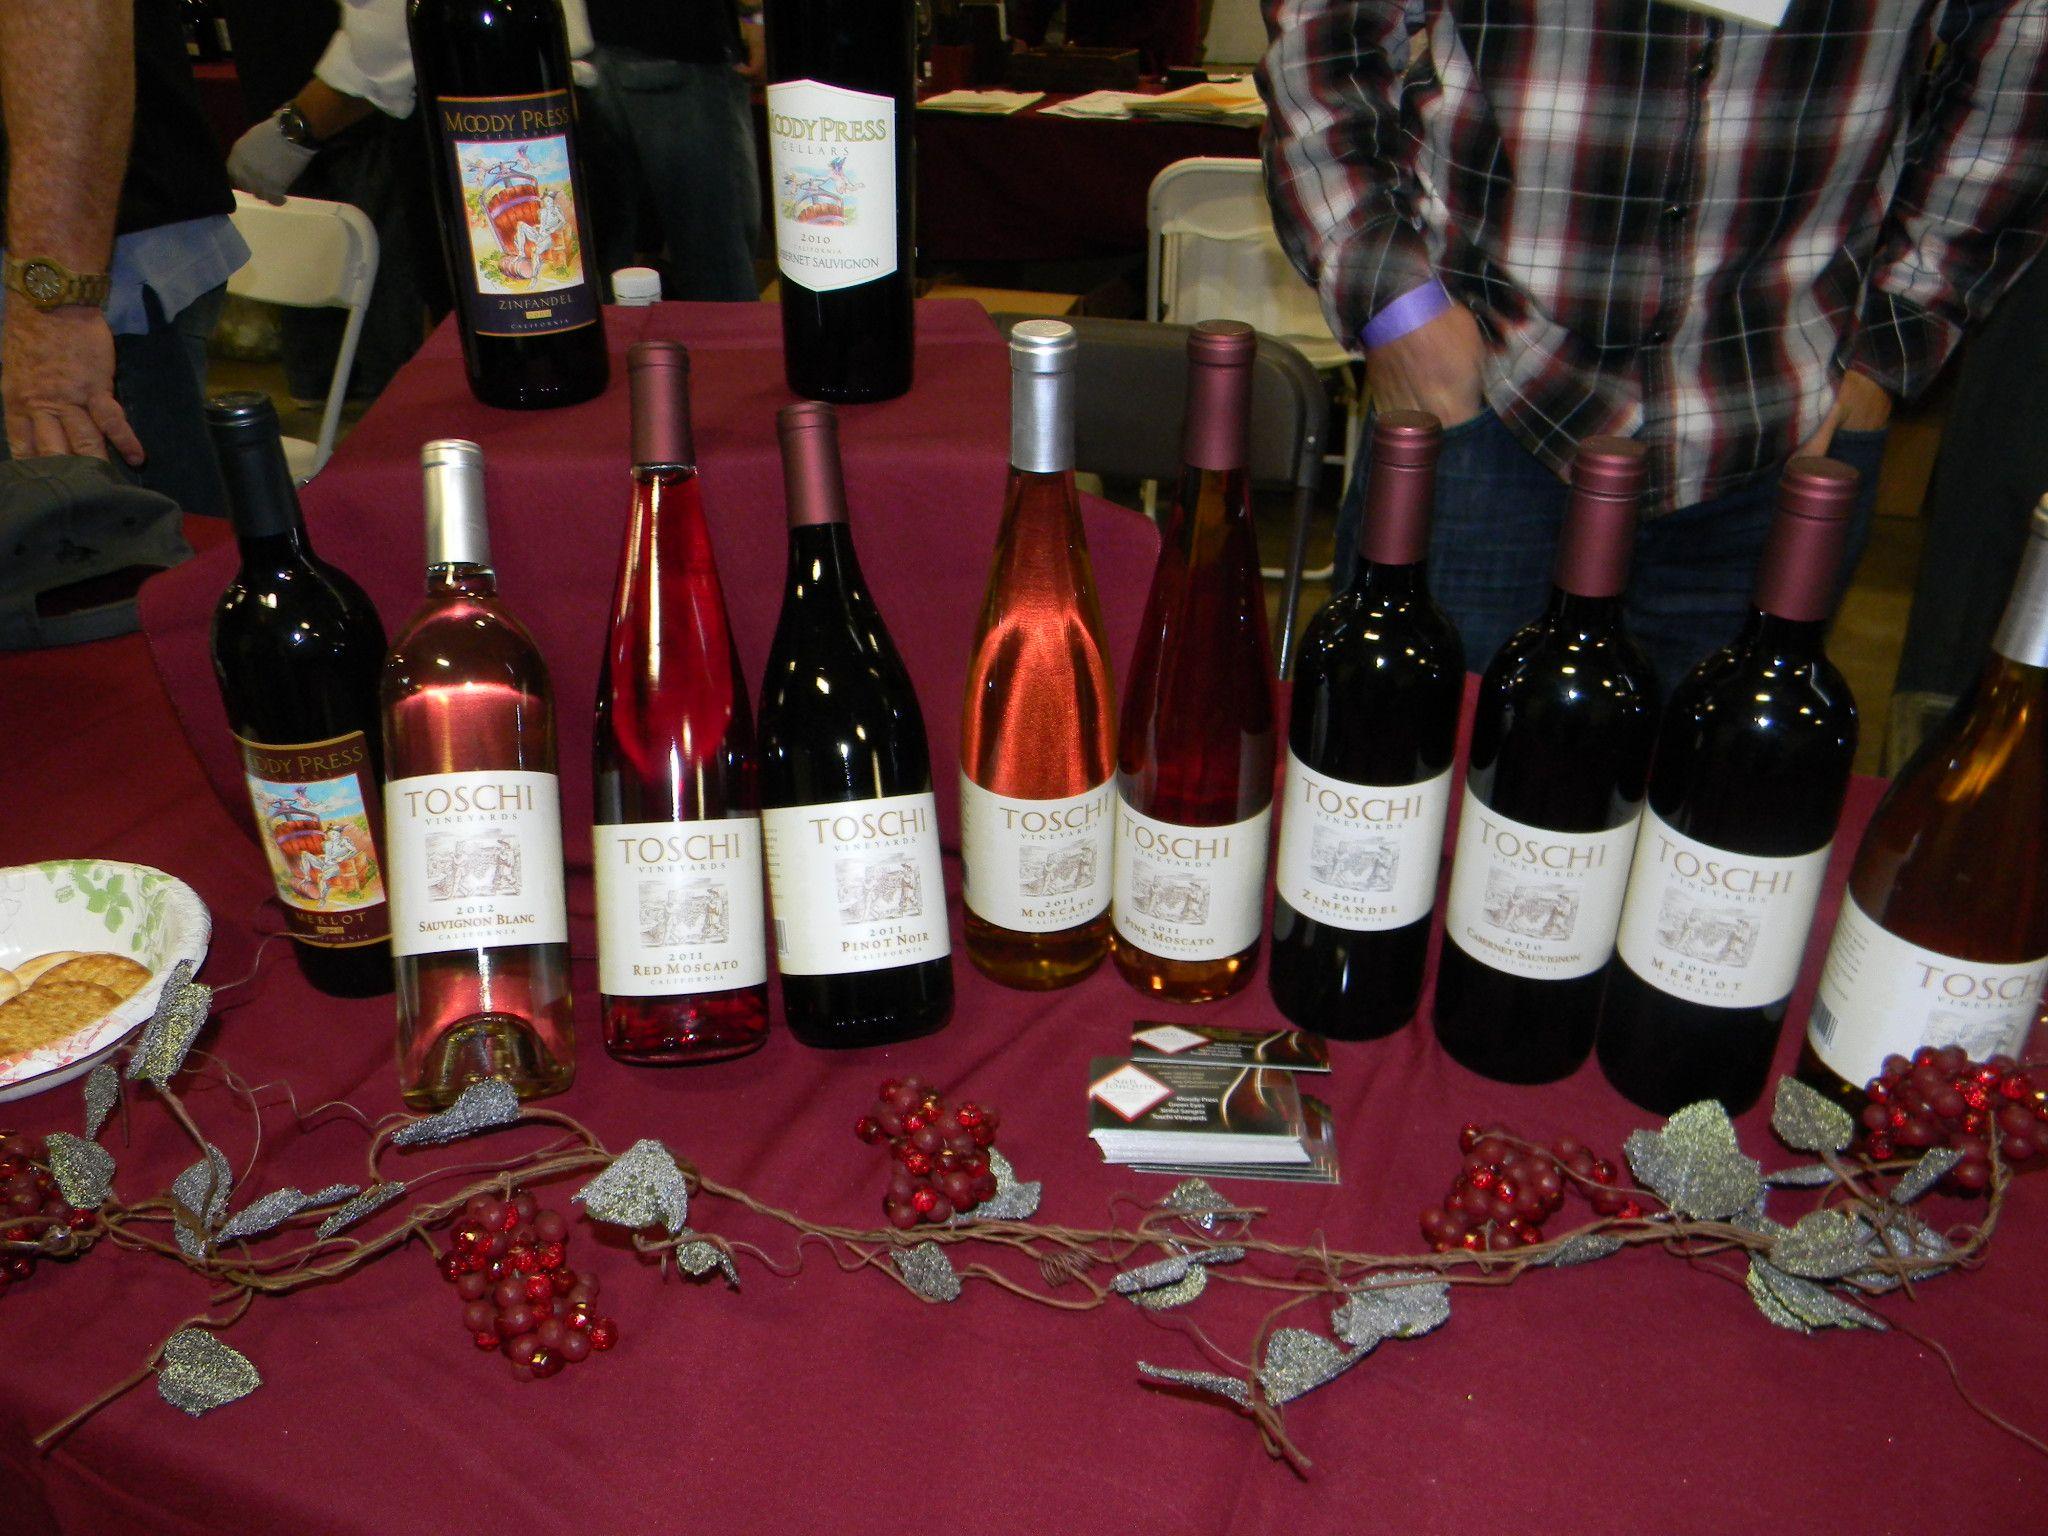 San Joaquin Wine Co Madera California Wine Bottle Wine Madera